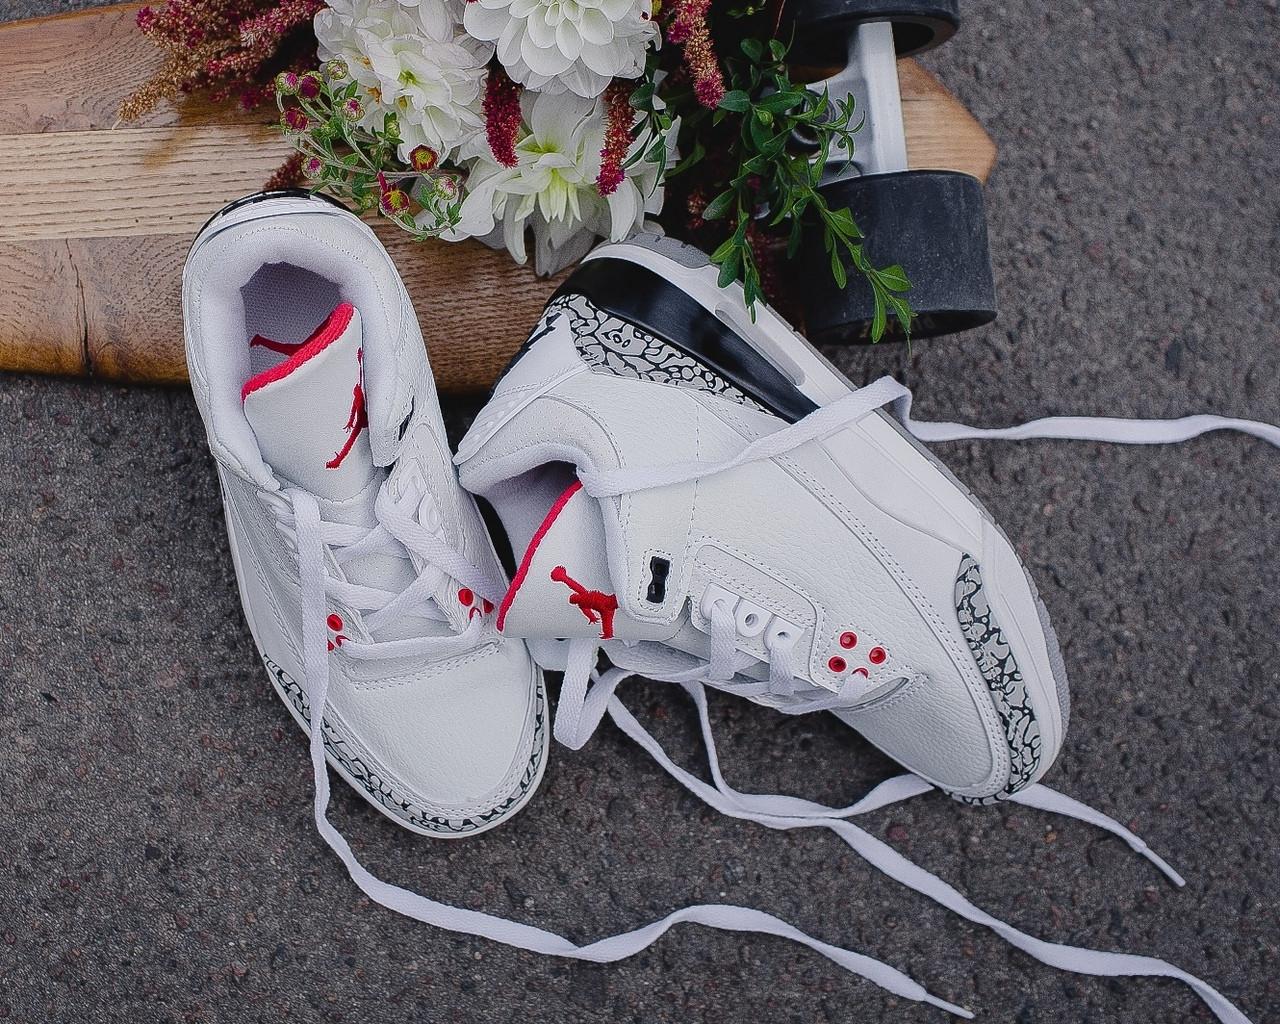 565483efc979 NIke Air Jordan 4 Retro White Cement   женские кроссовки  белые  кожаные